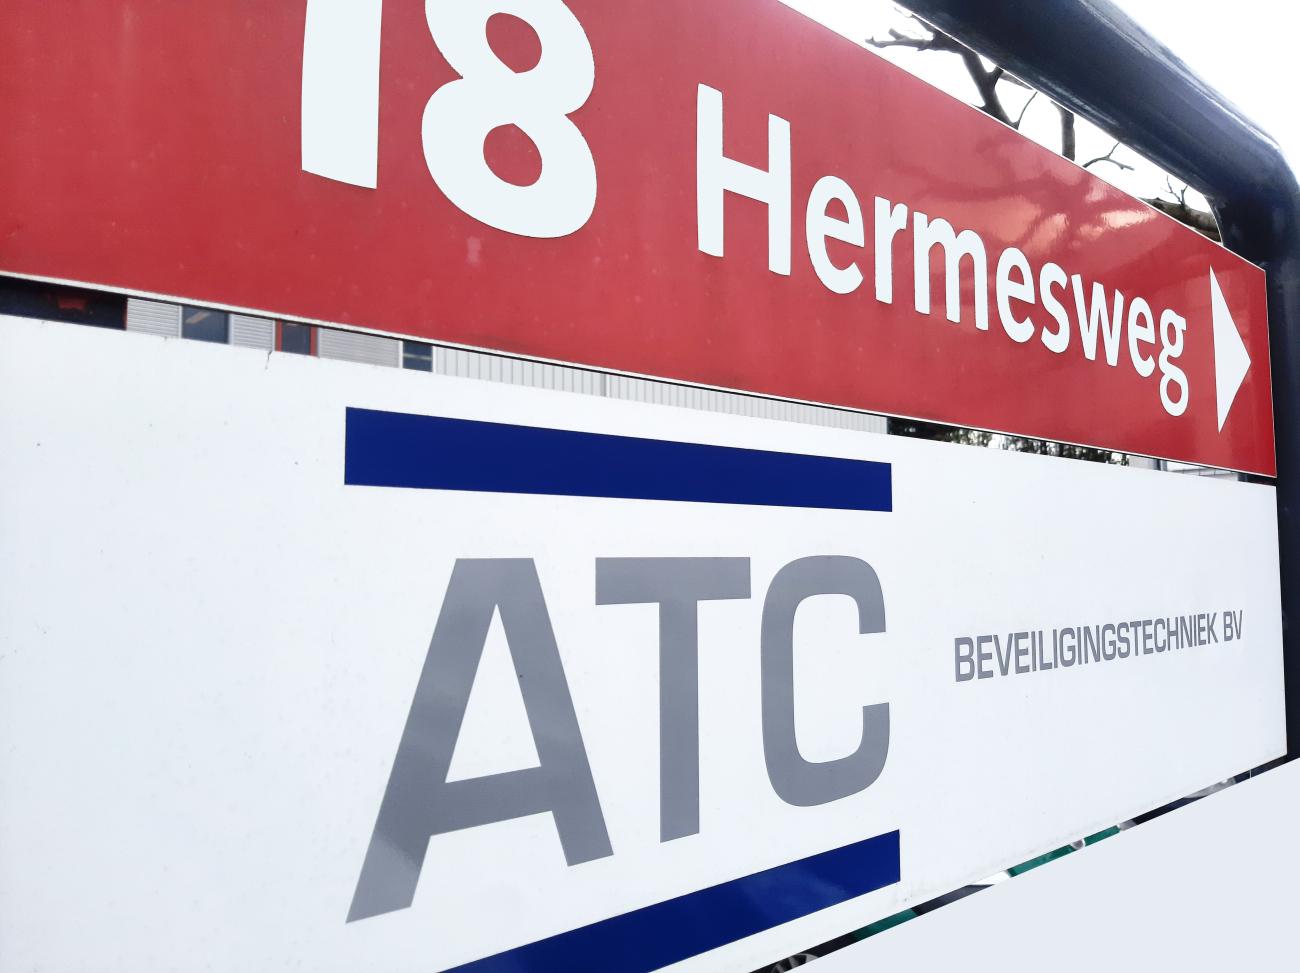 Logo van ATC Beveiligingstechniek BV